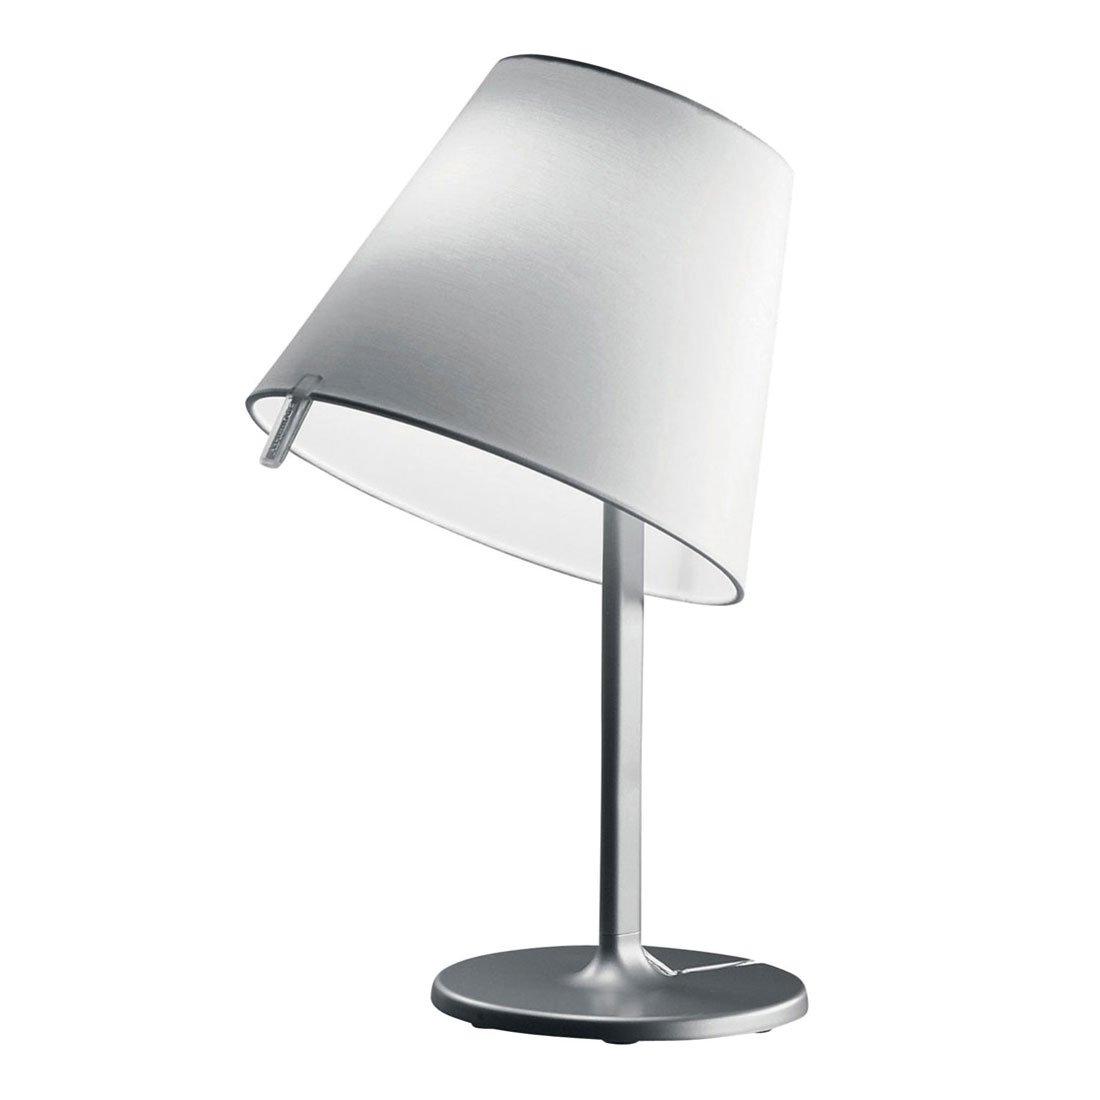 Melampo Notte Tafellamp - Artemide